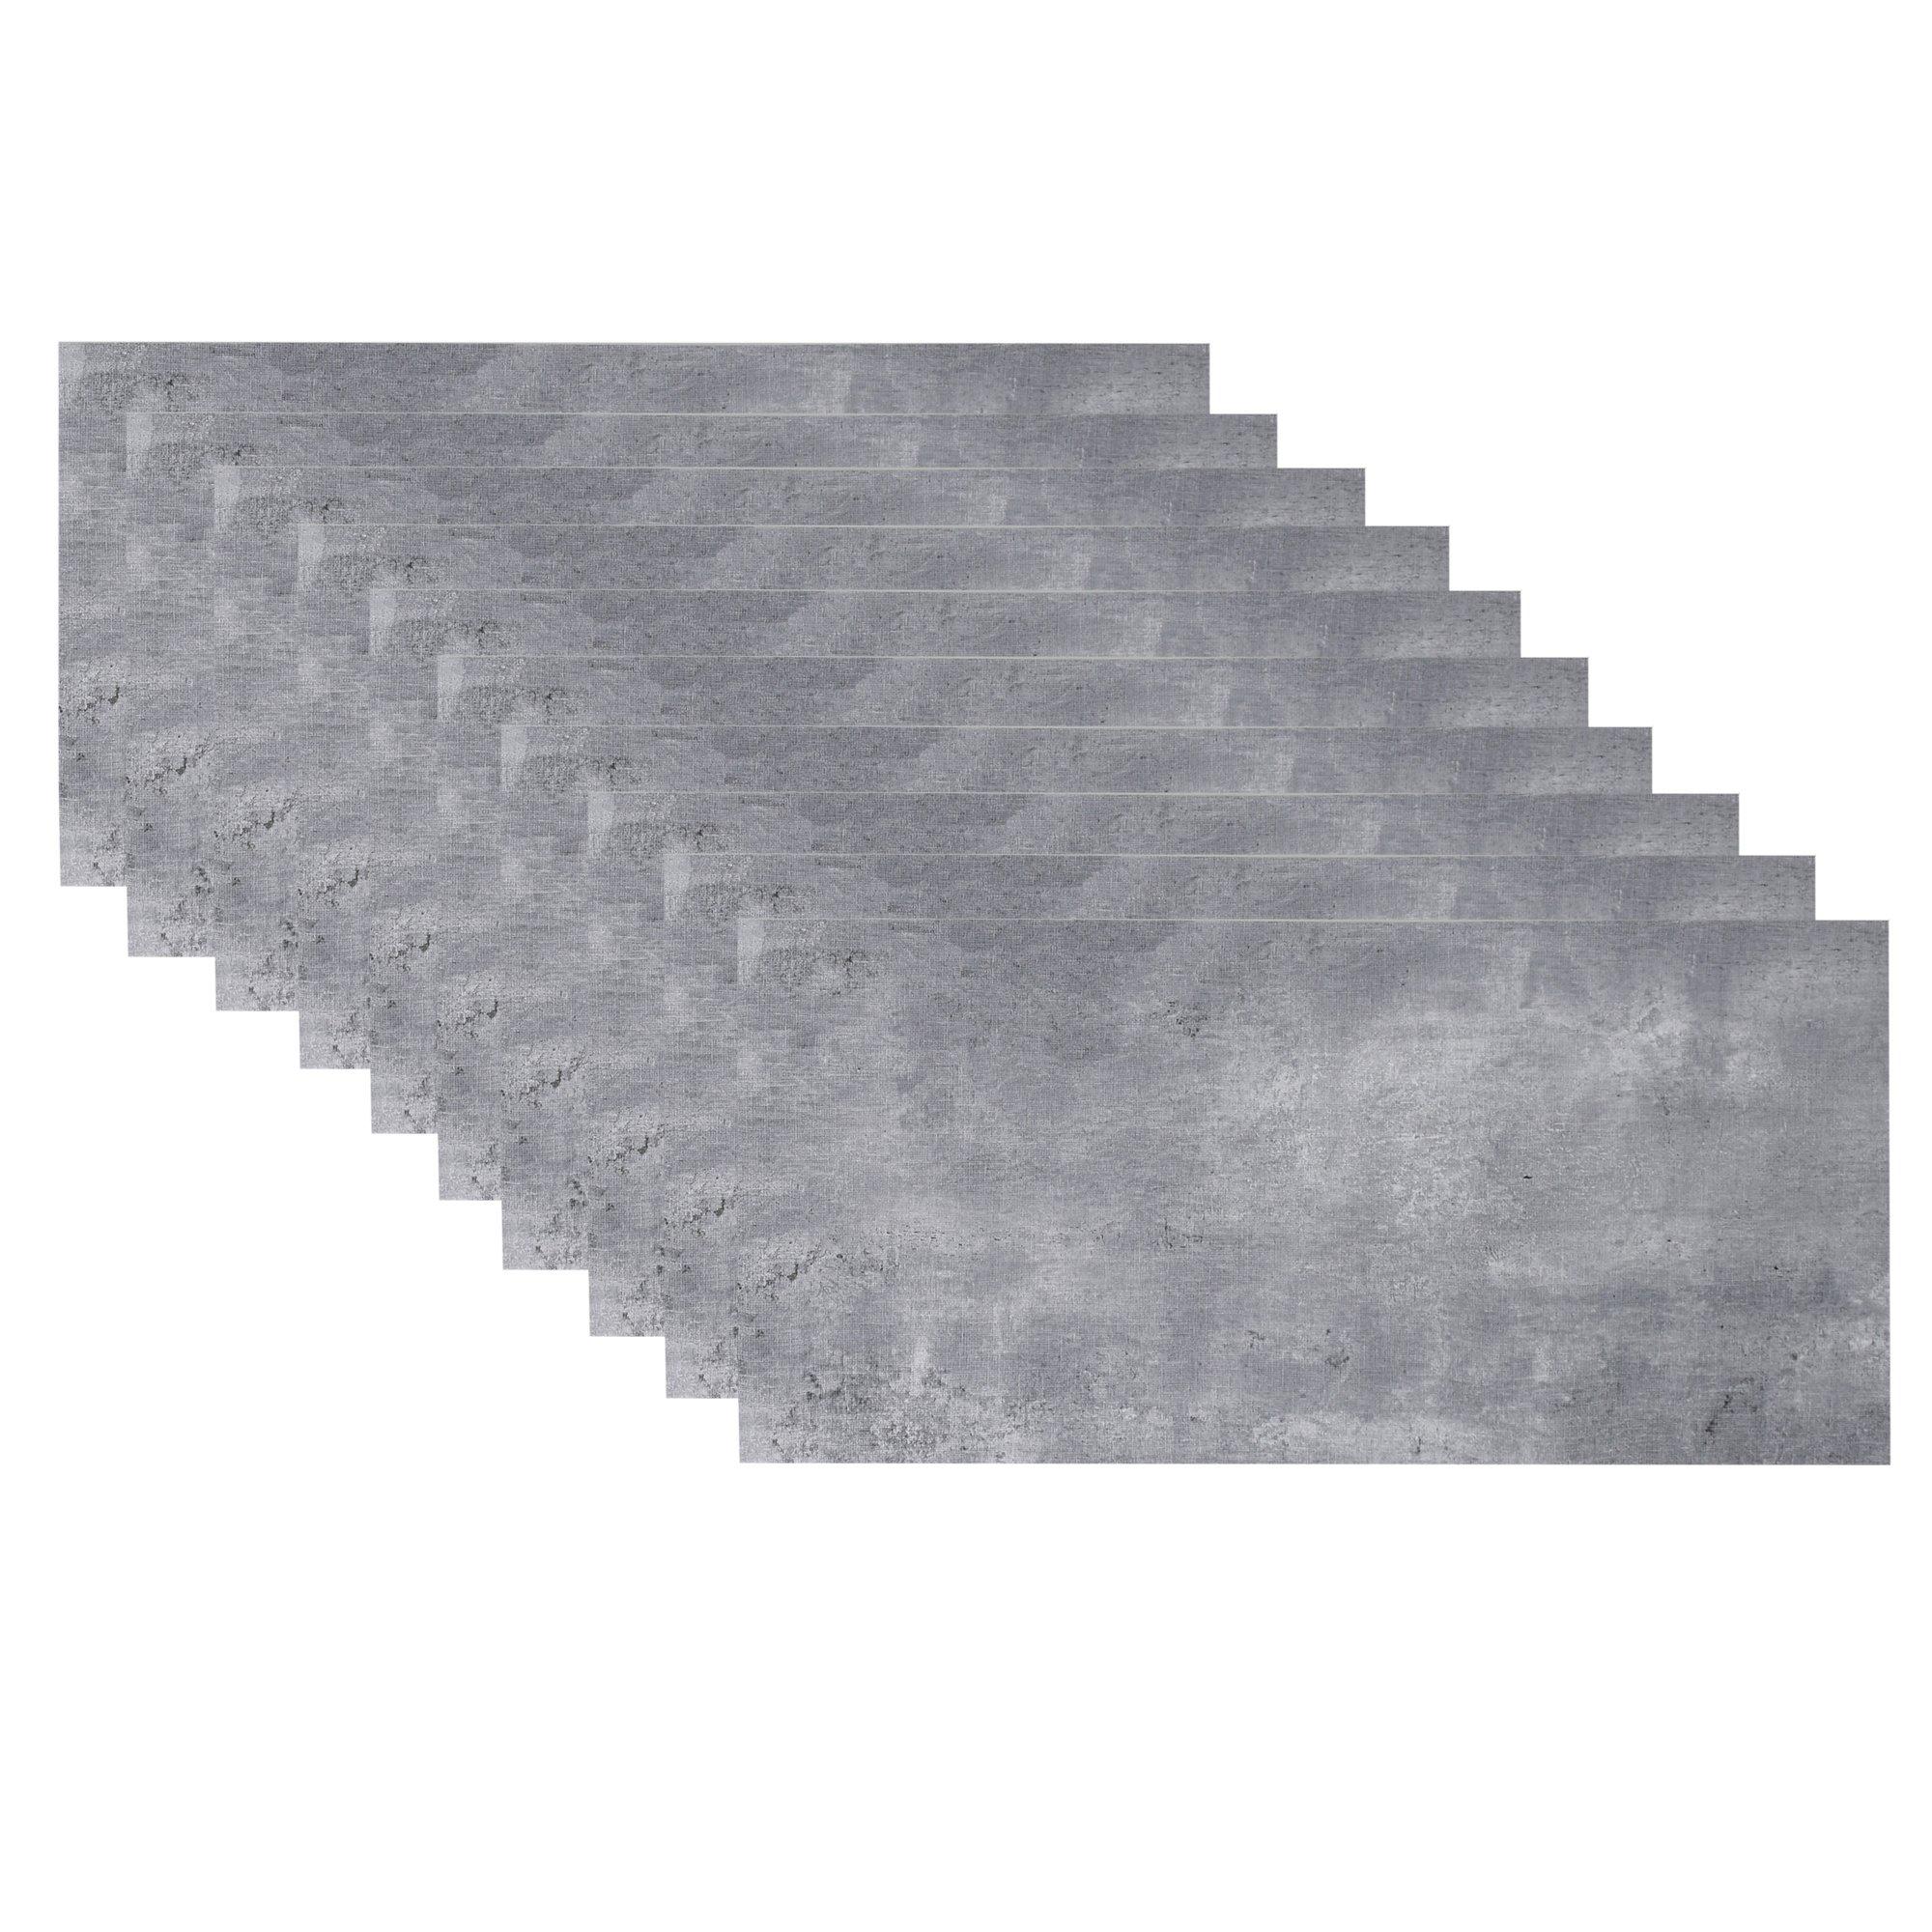 Self-adhesive Floor Plank Wall Sticker 10Pcs